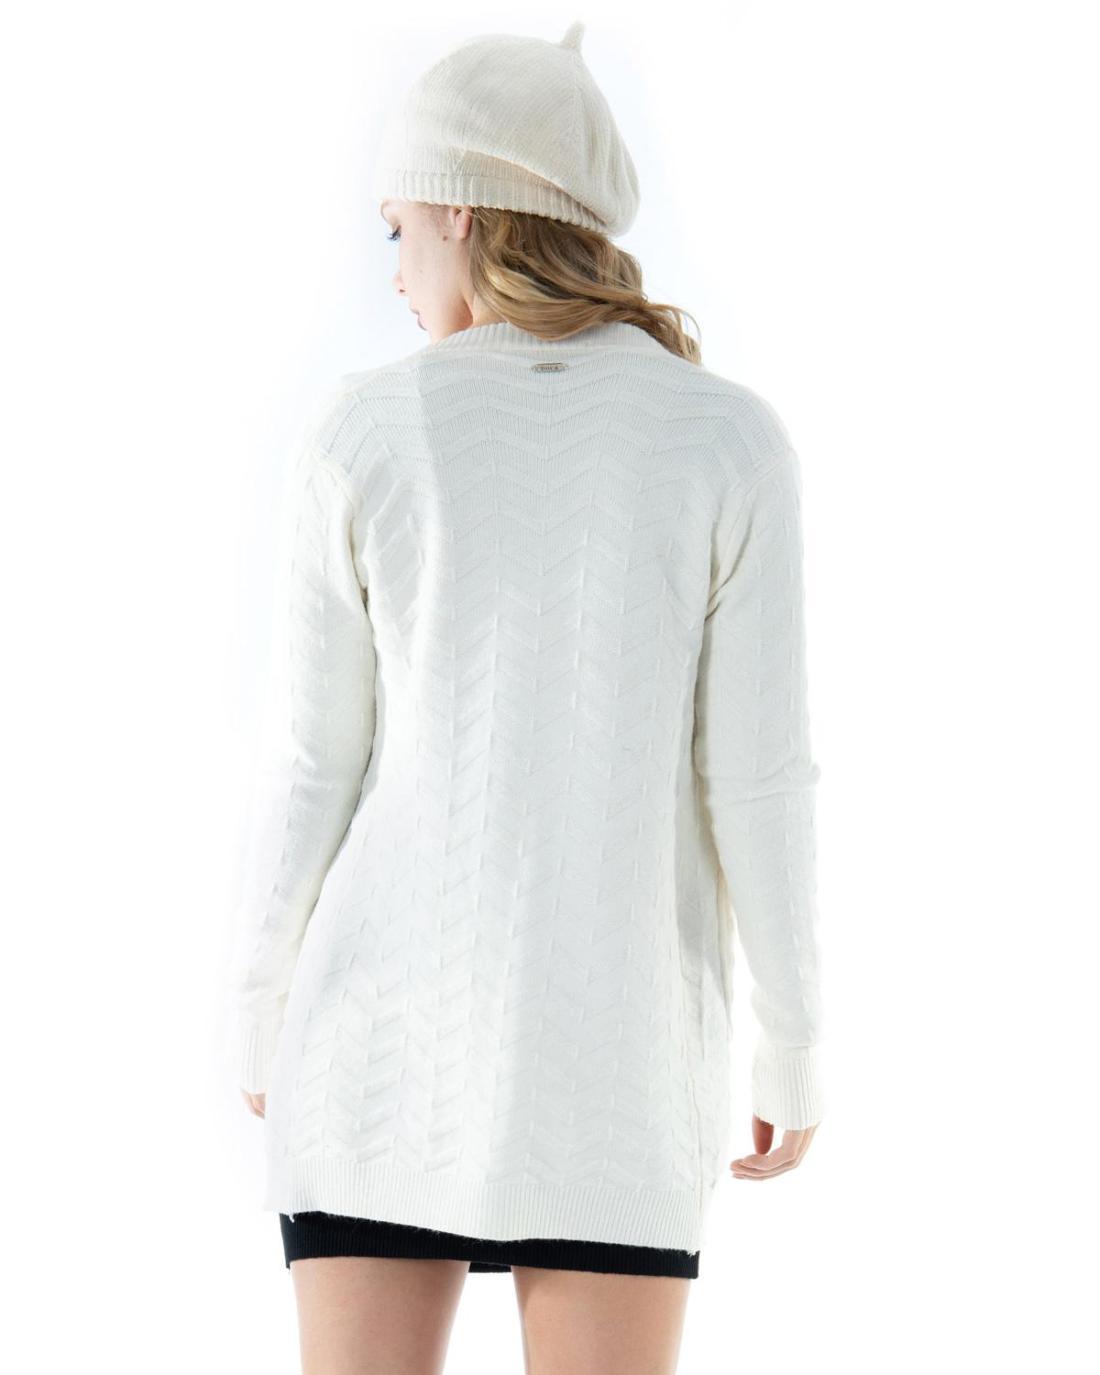 Weiße Strickjacke